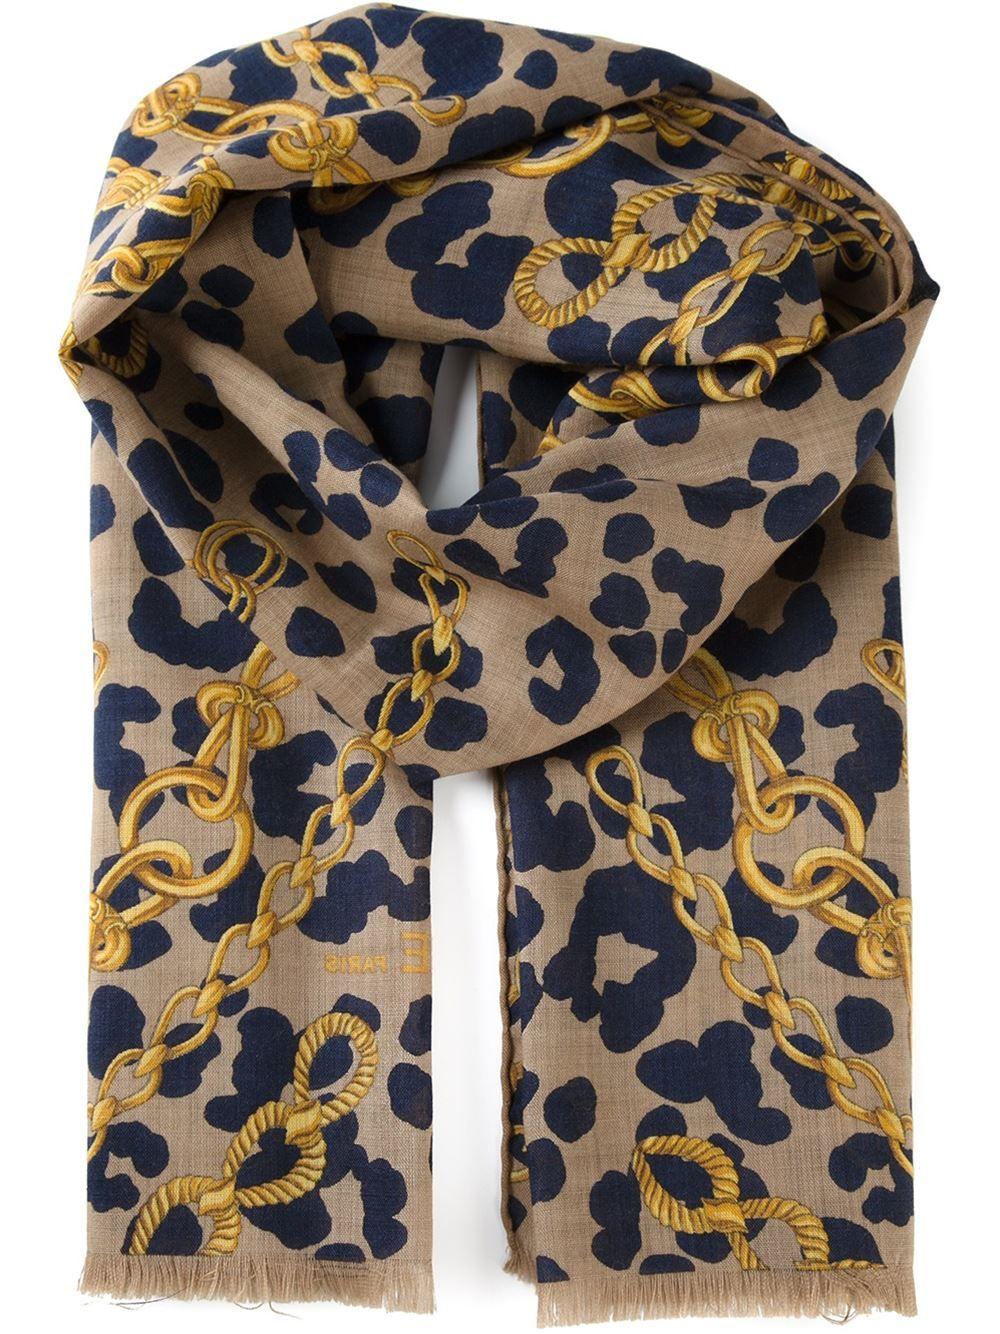 Céline Vintage Leopard Print Scarf - Katheleys Vintage - Farfetch.com